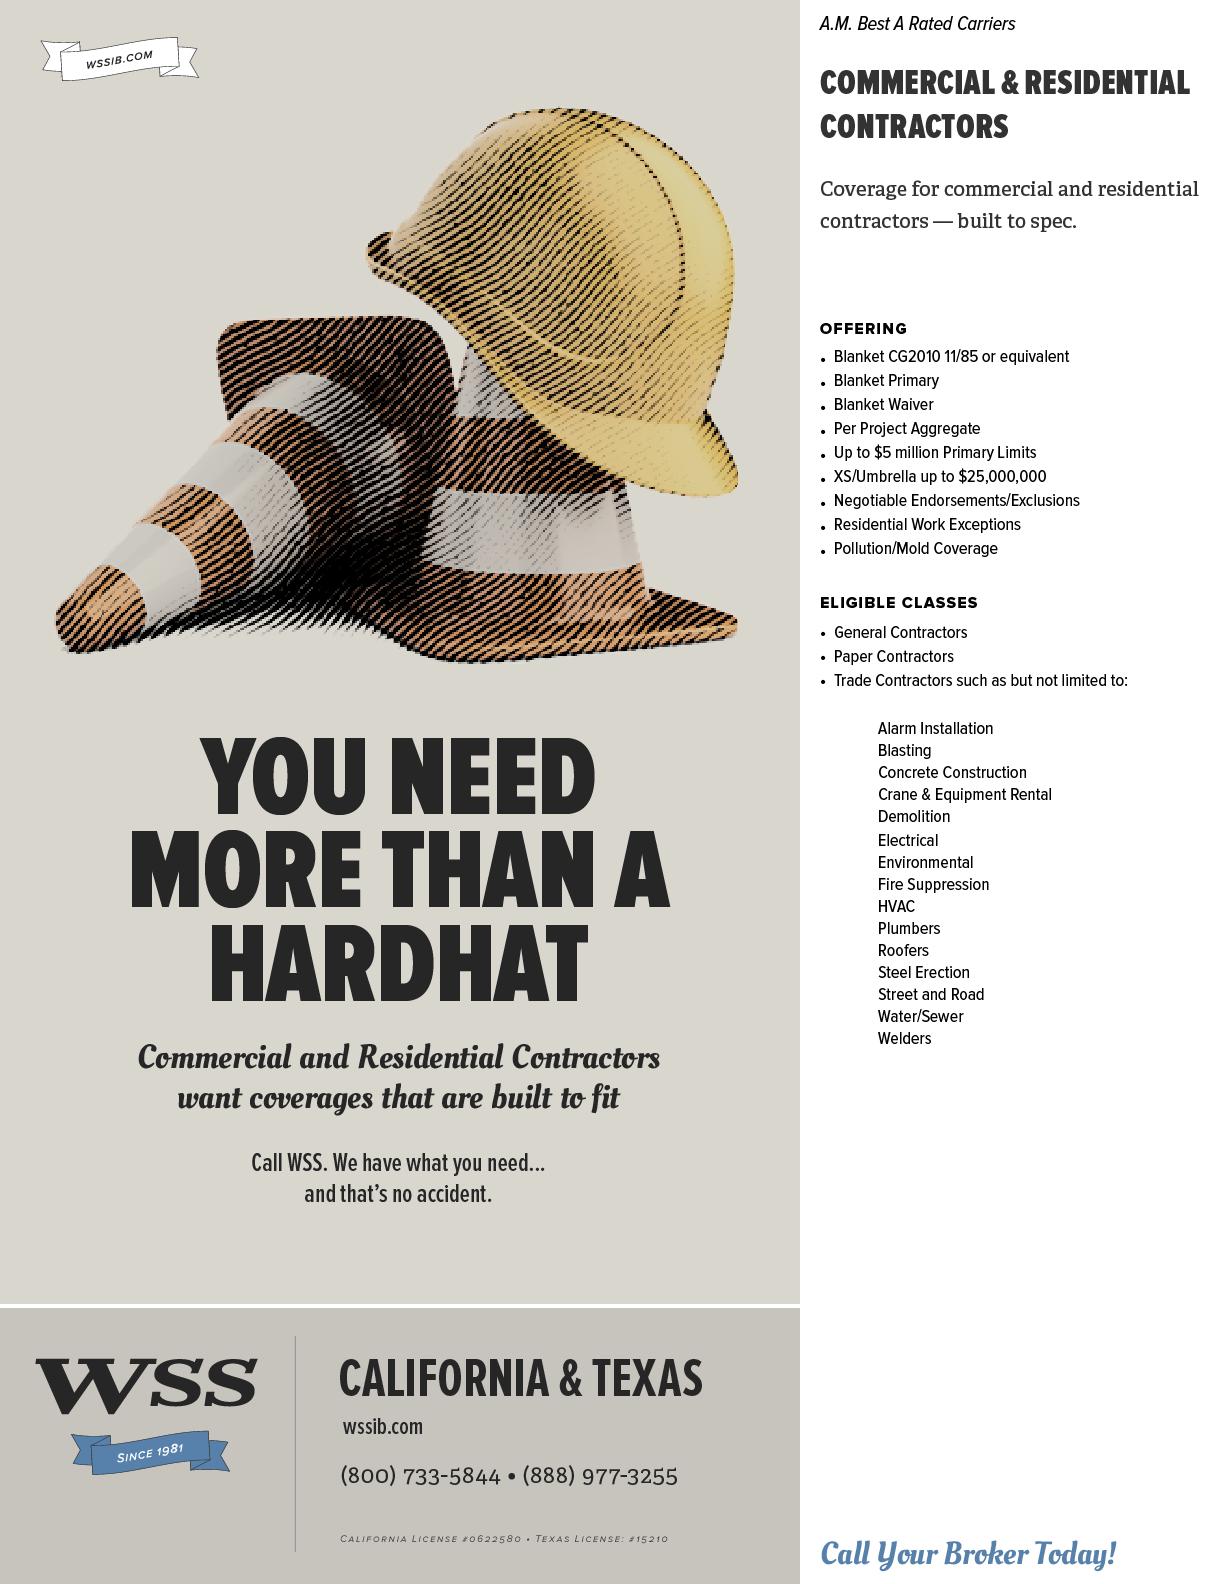 WSS-Flyer-CommercialContractors.png